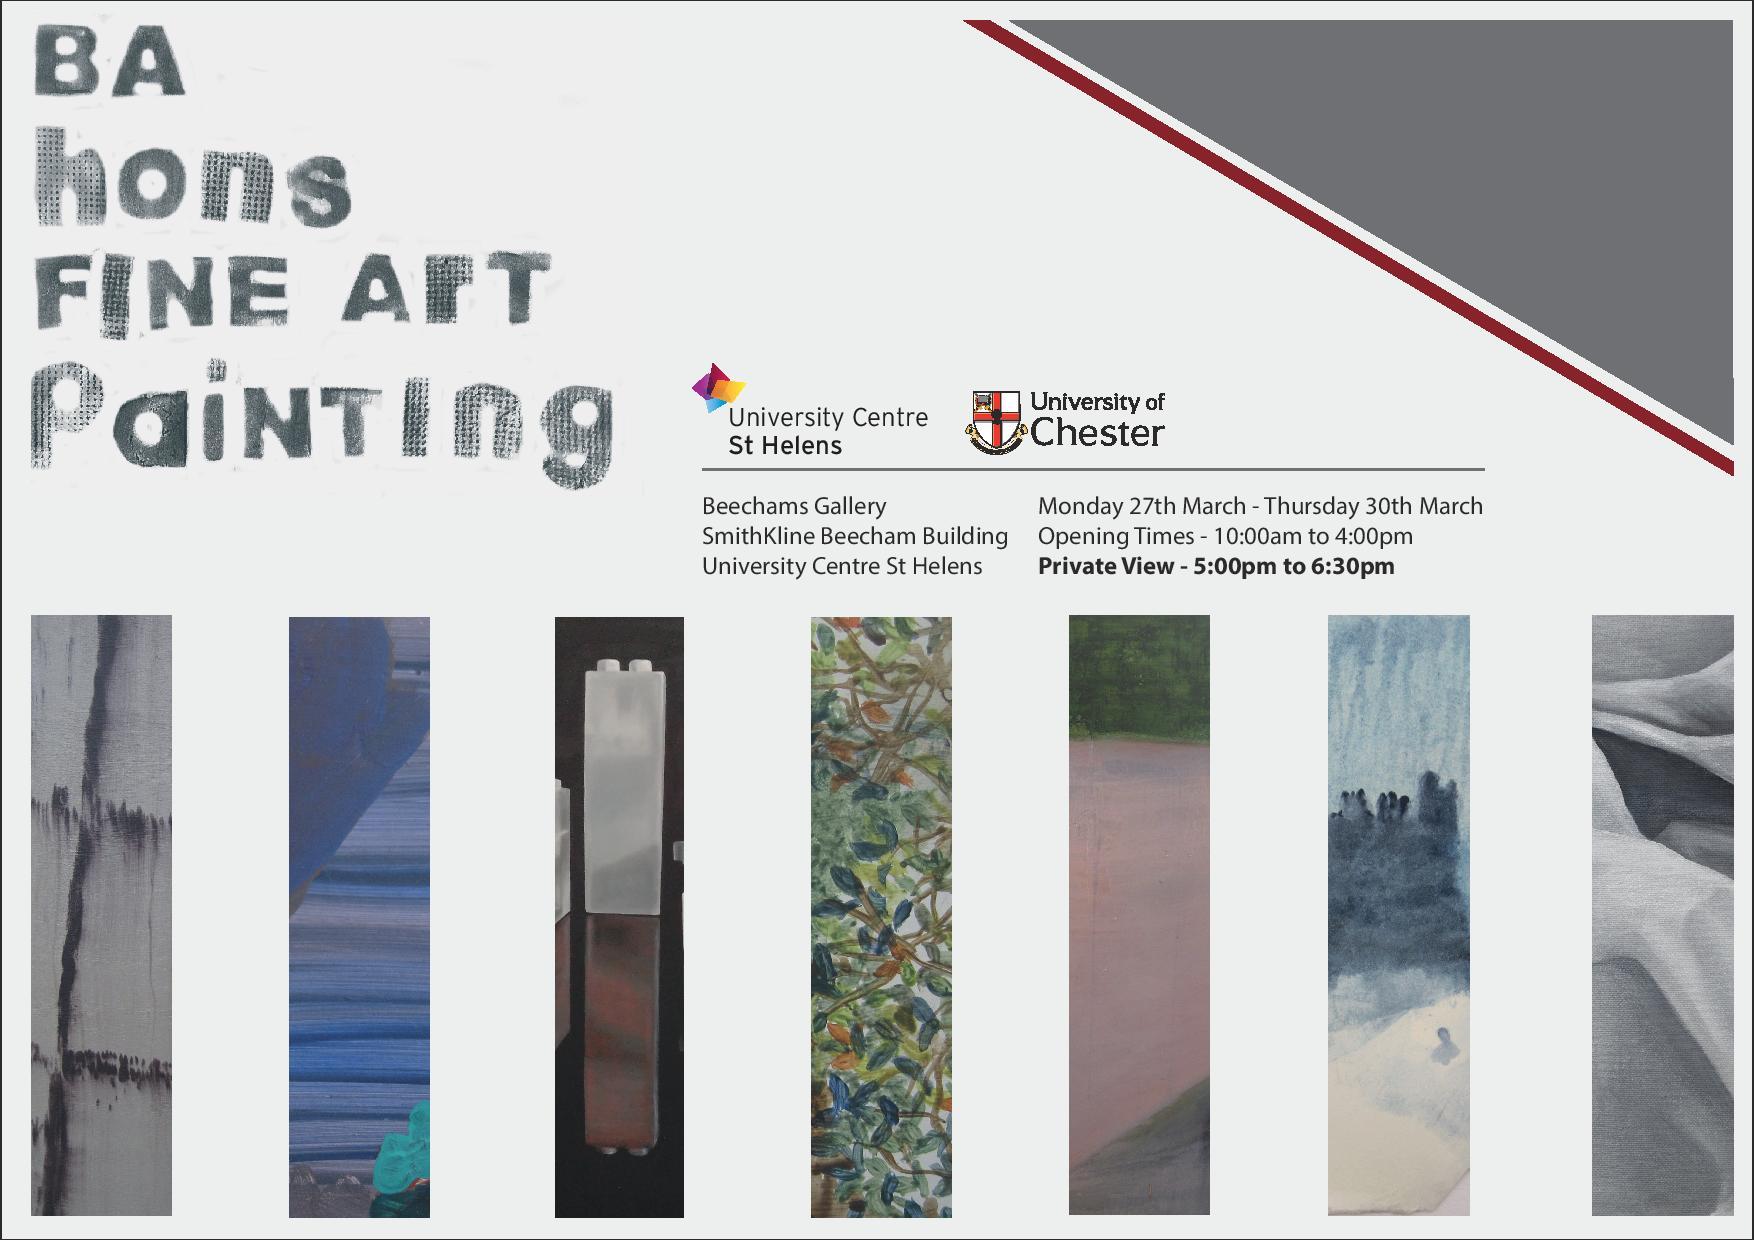 Beechams Gallery: BA hons FINE ART Painting